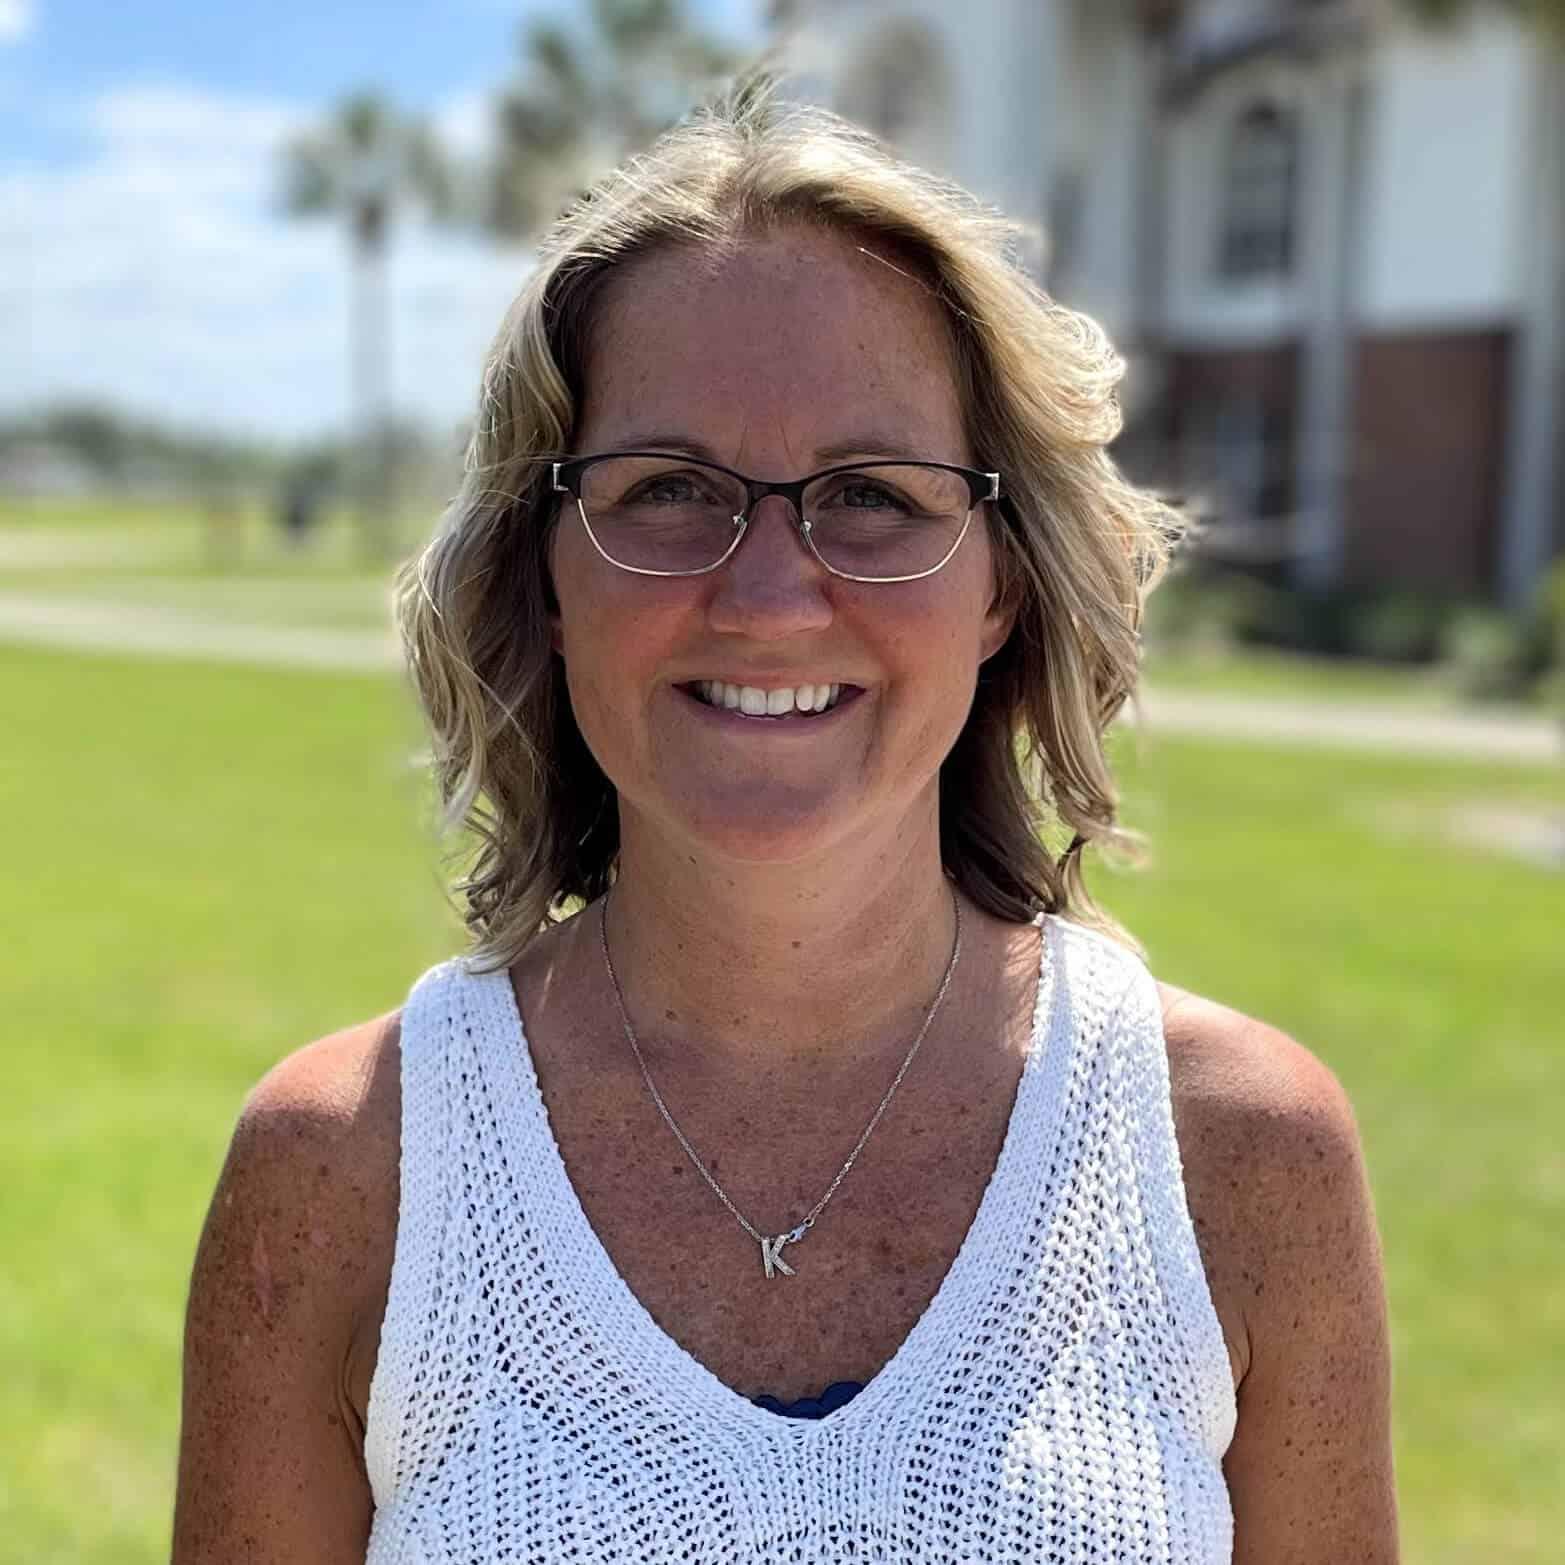 Dr. Kimberly Bartasavage